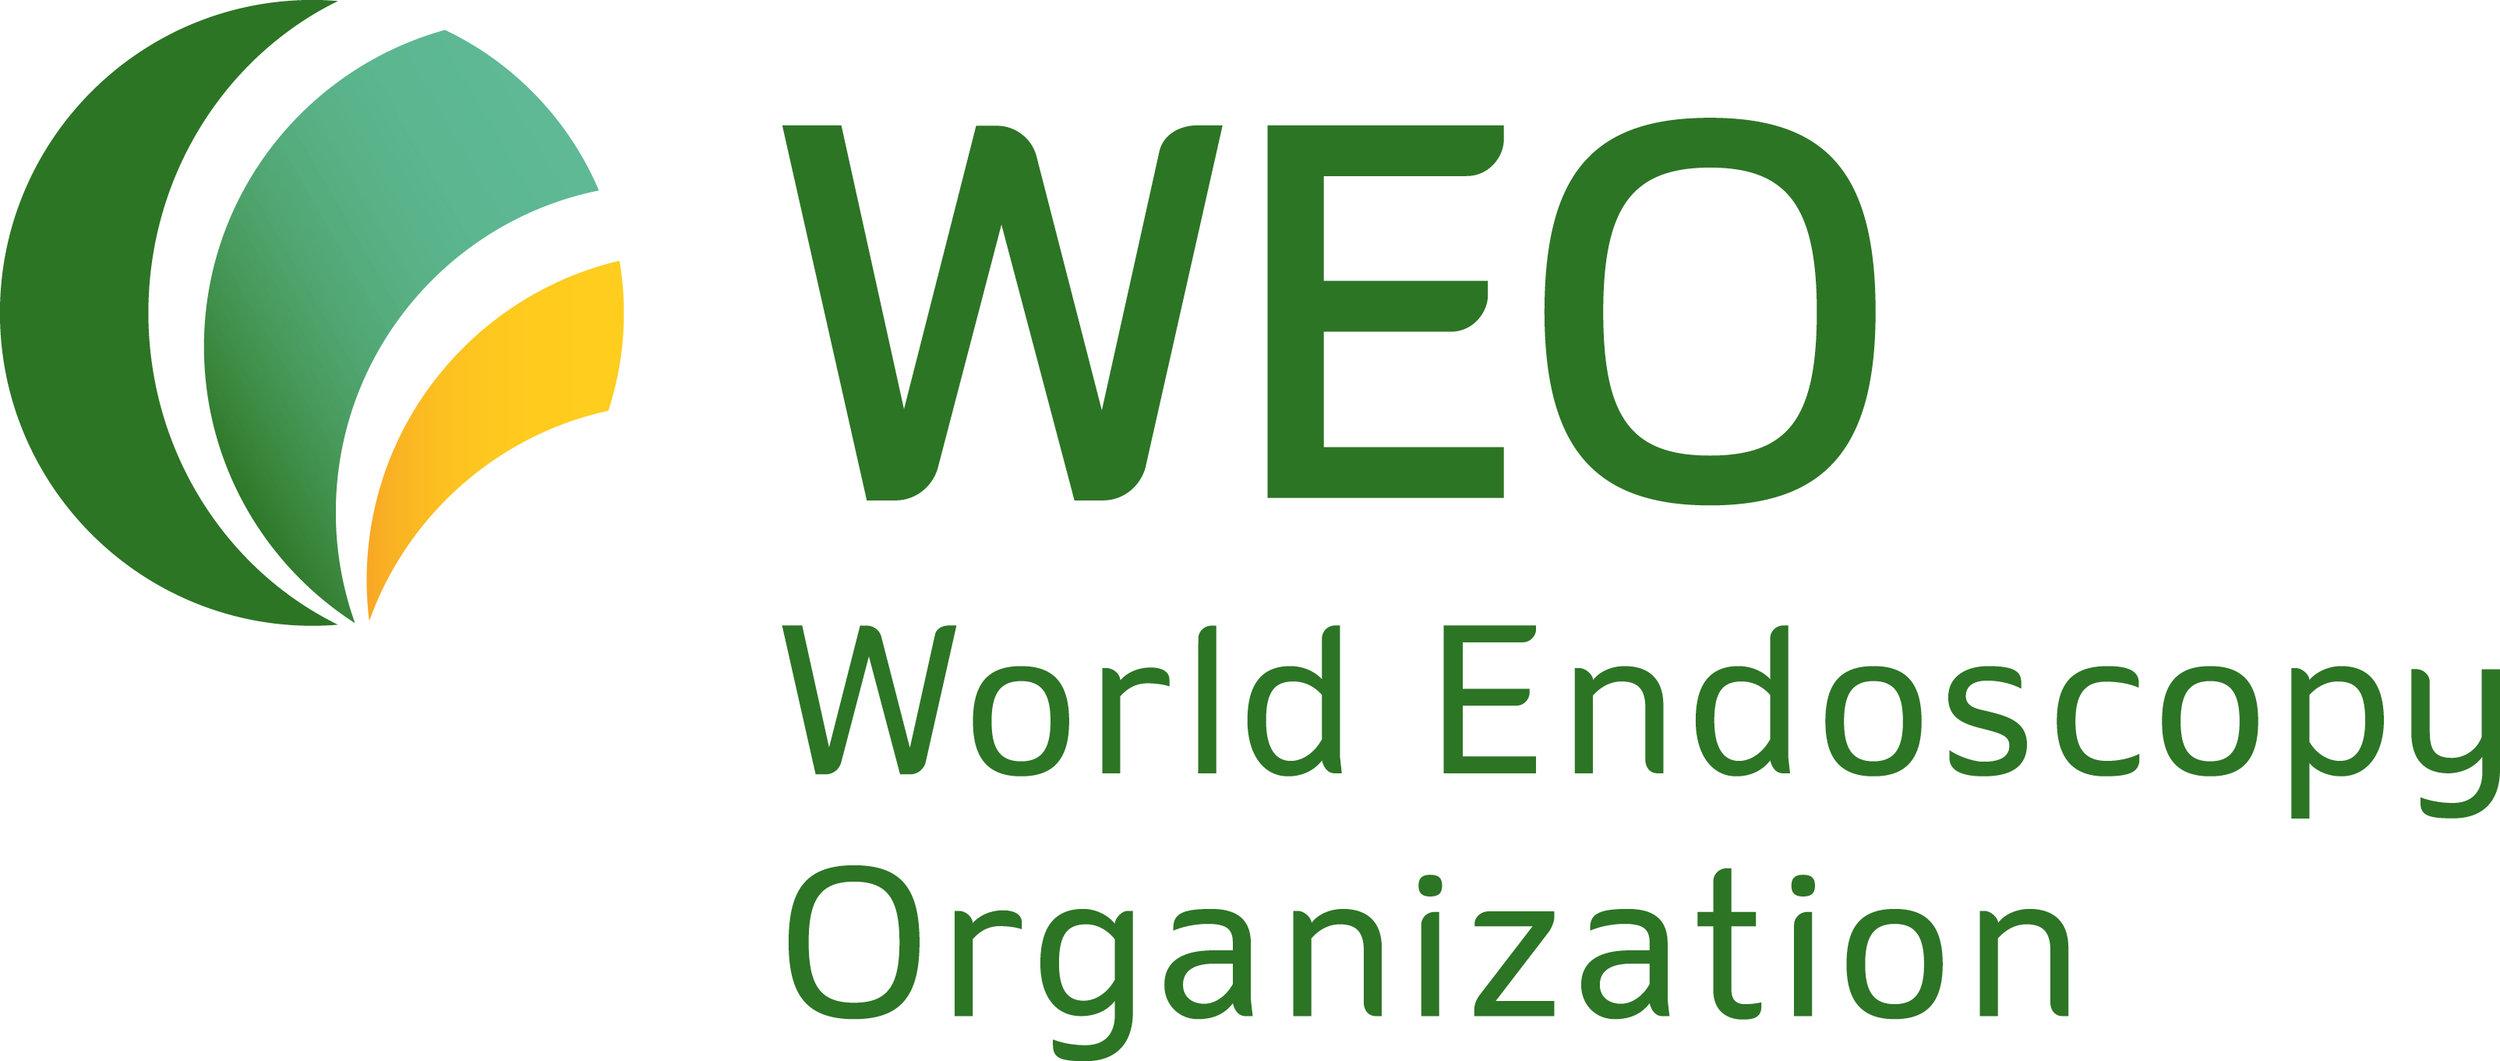 World Endoscopy Organization